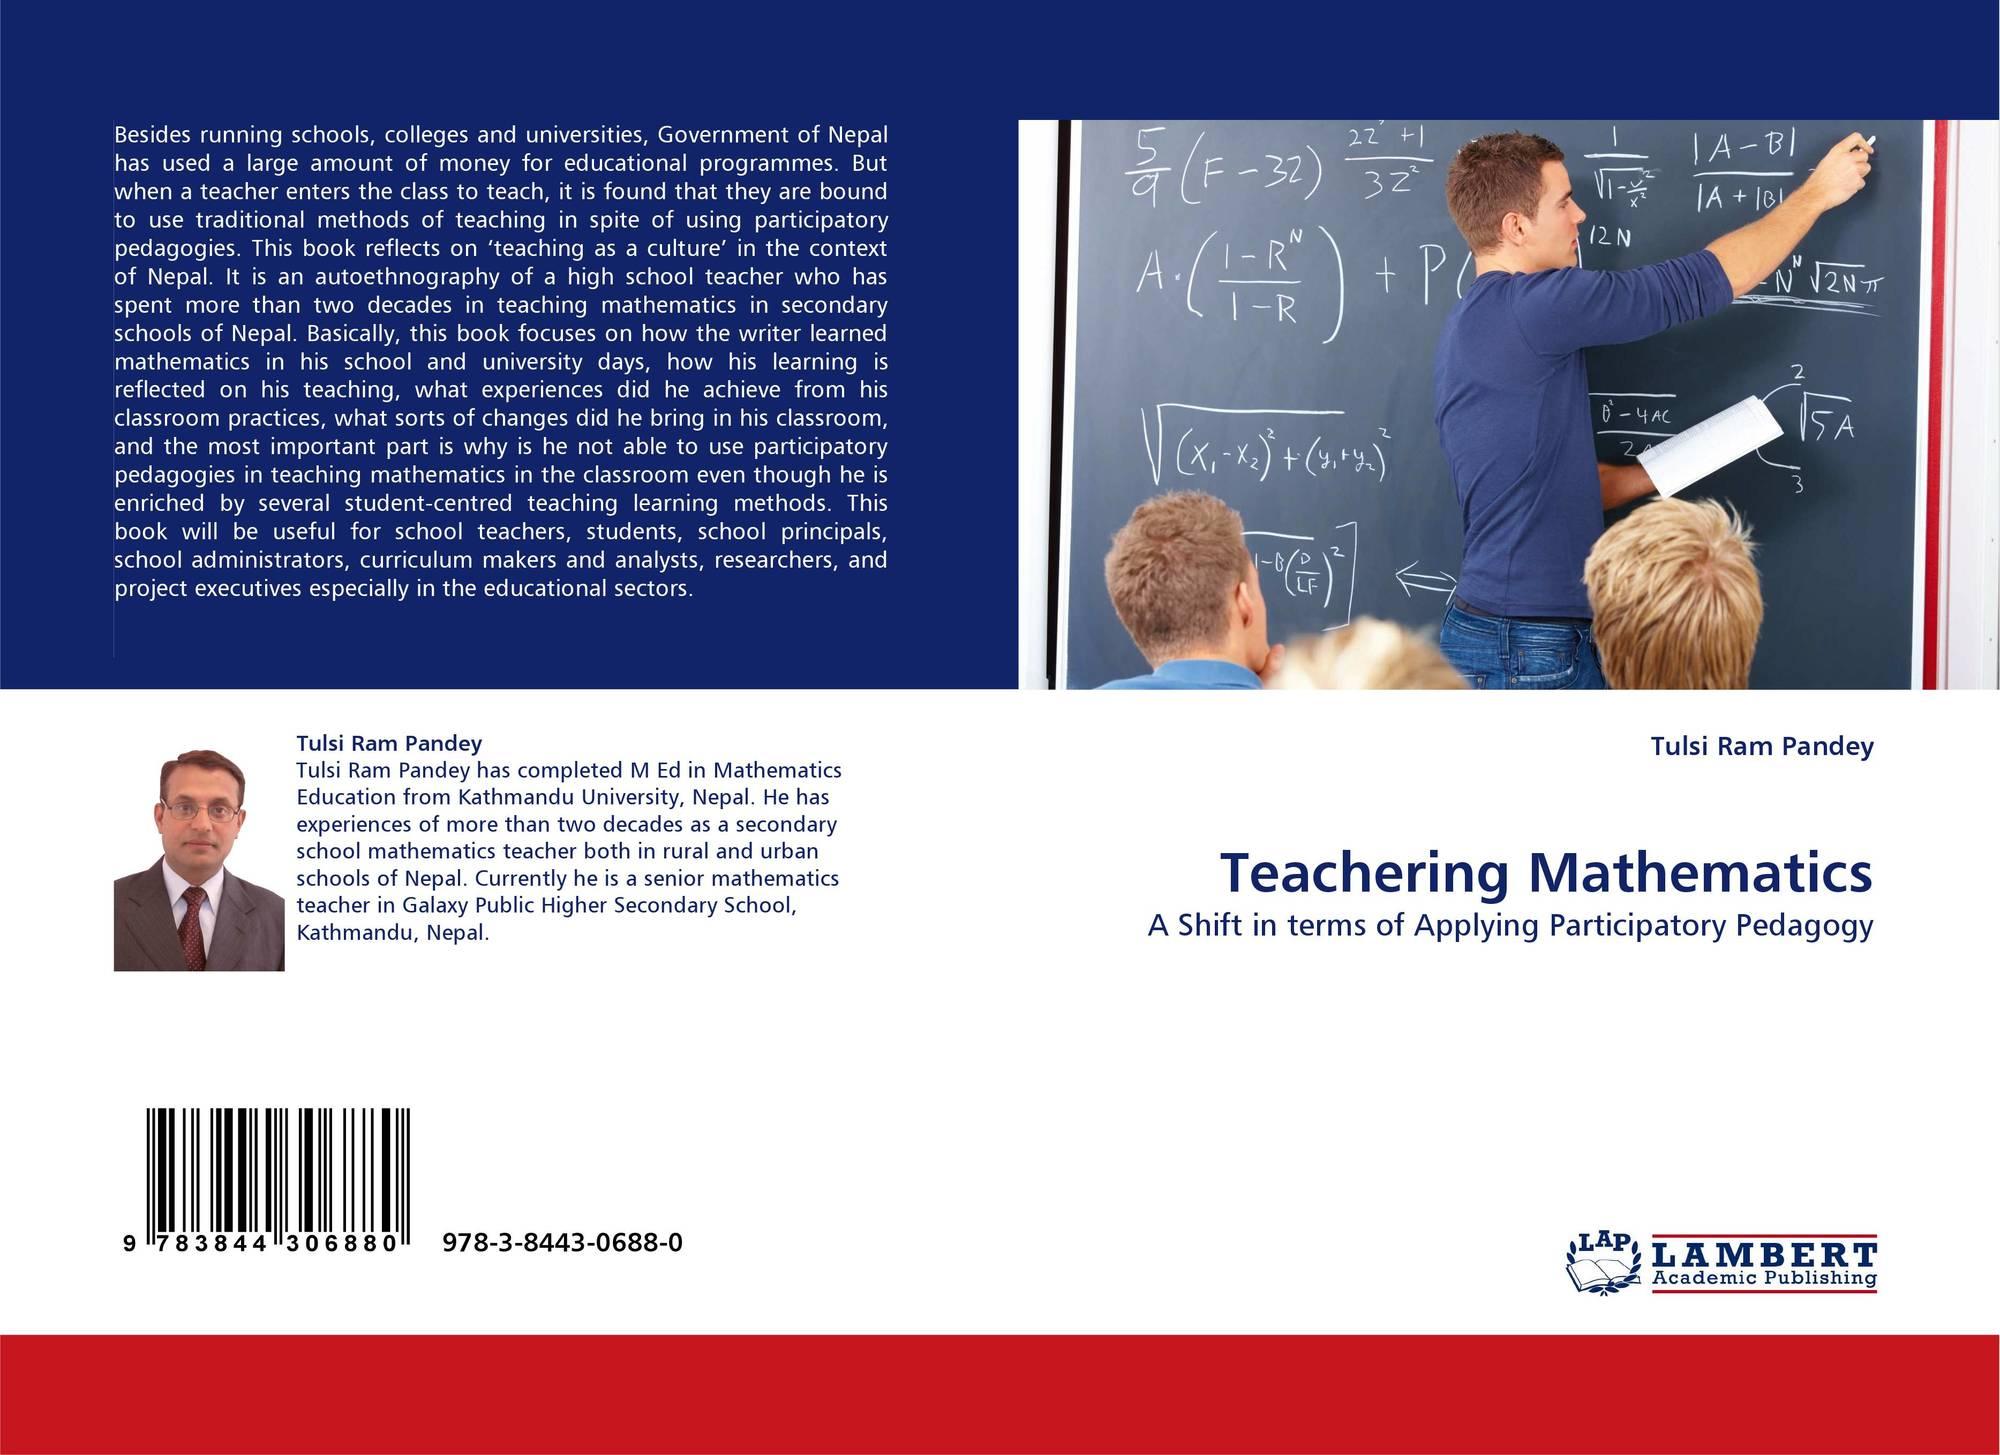 secondary school students' foundation in mathematics